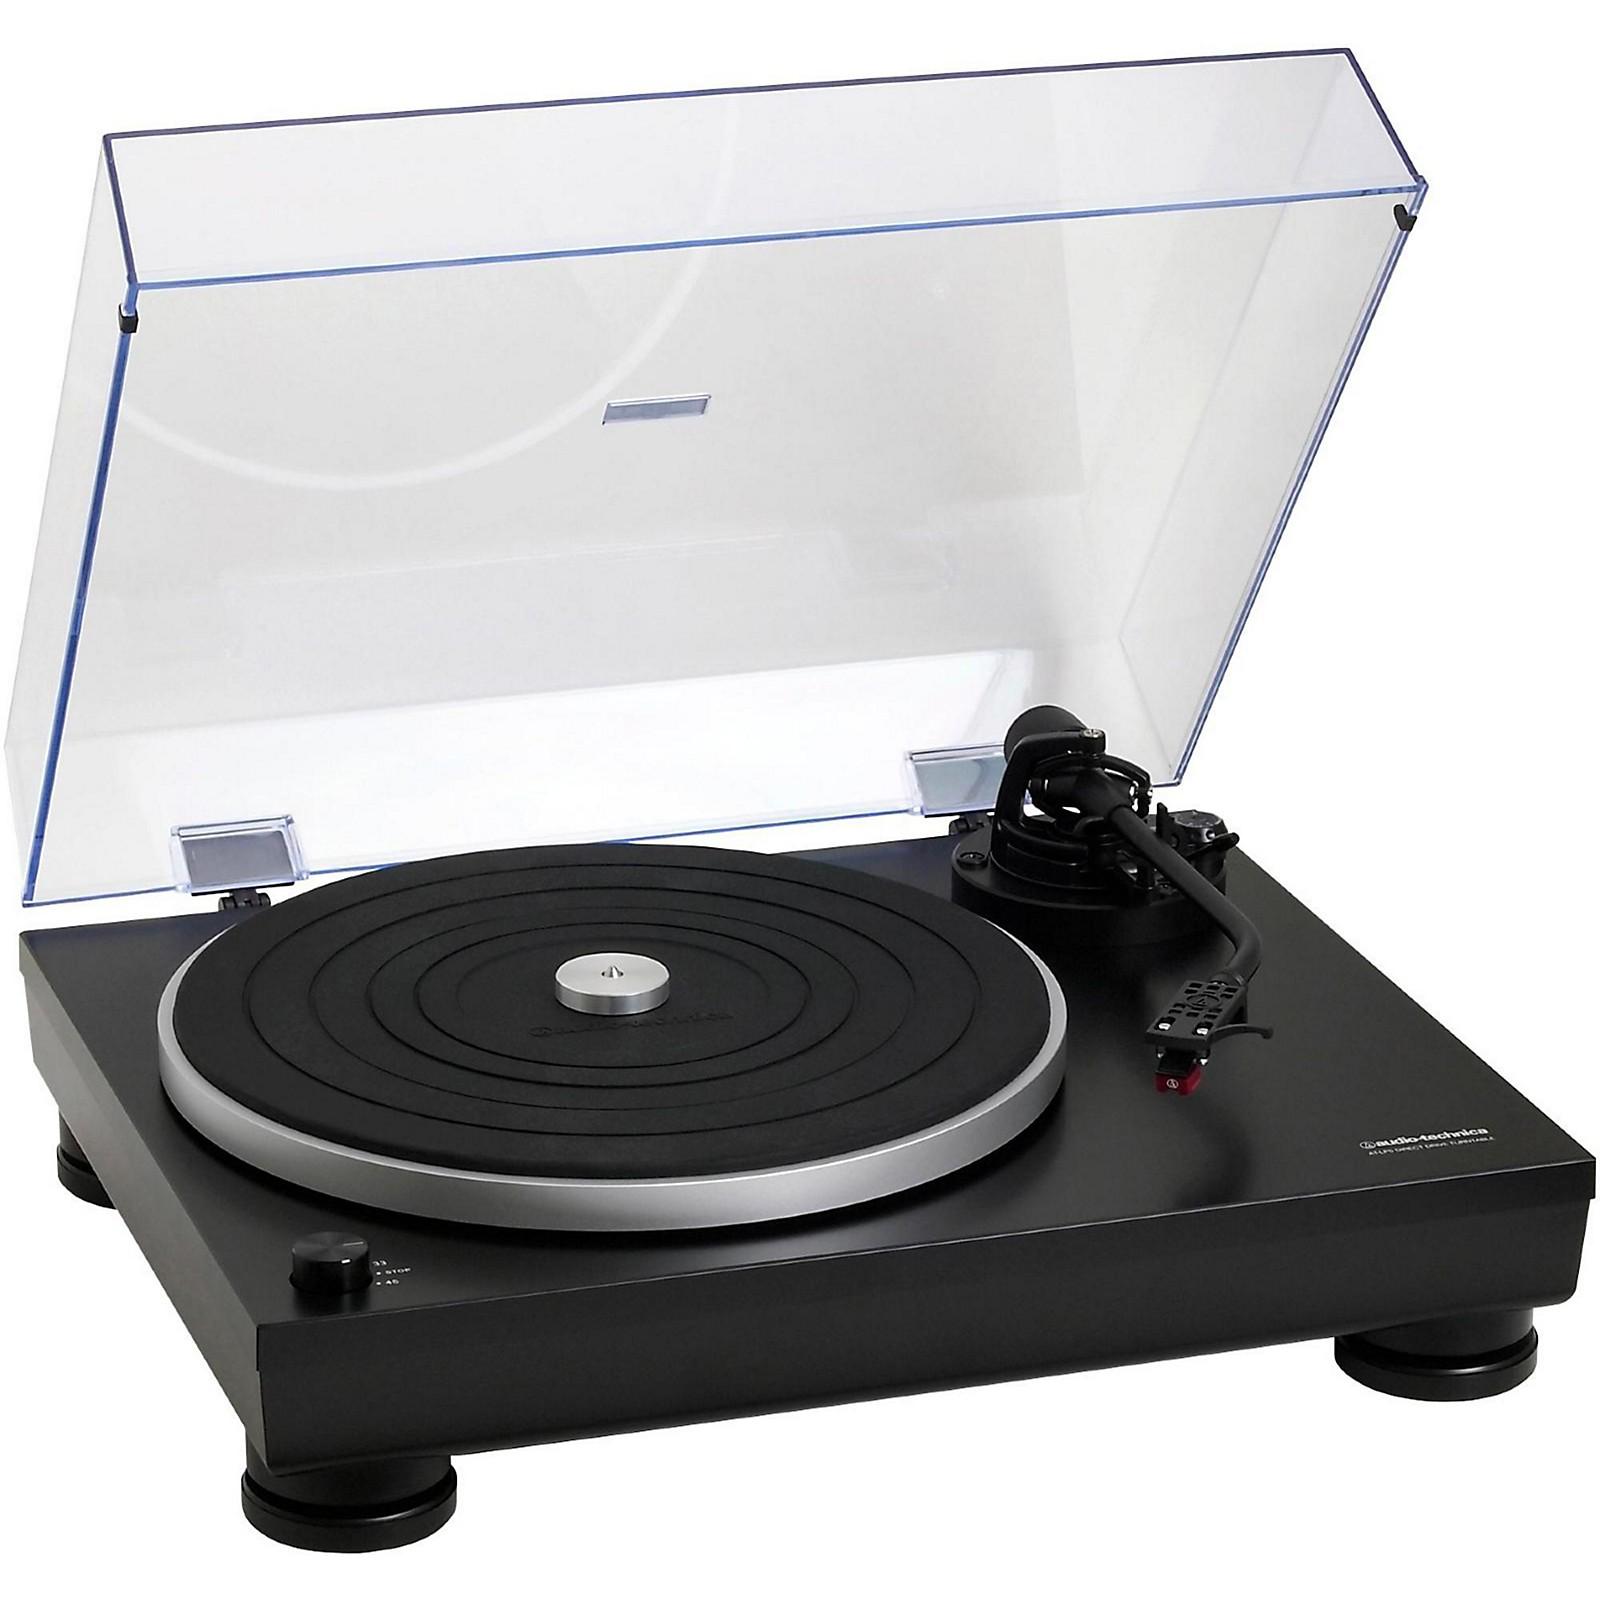 Audio-Technica AT-LP5 Direct-Drive Record Player